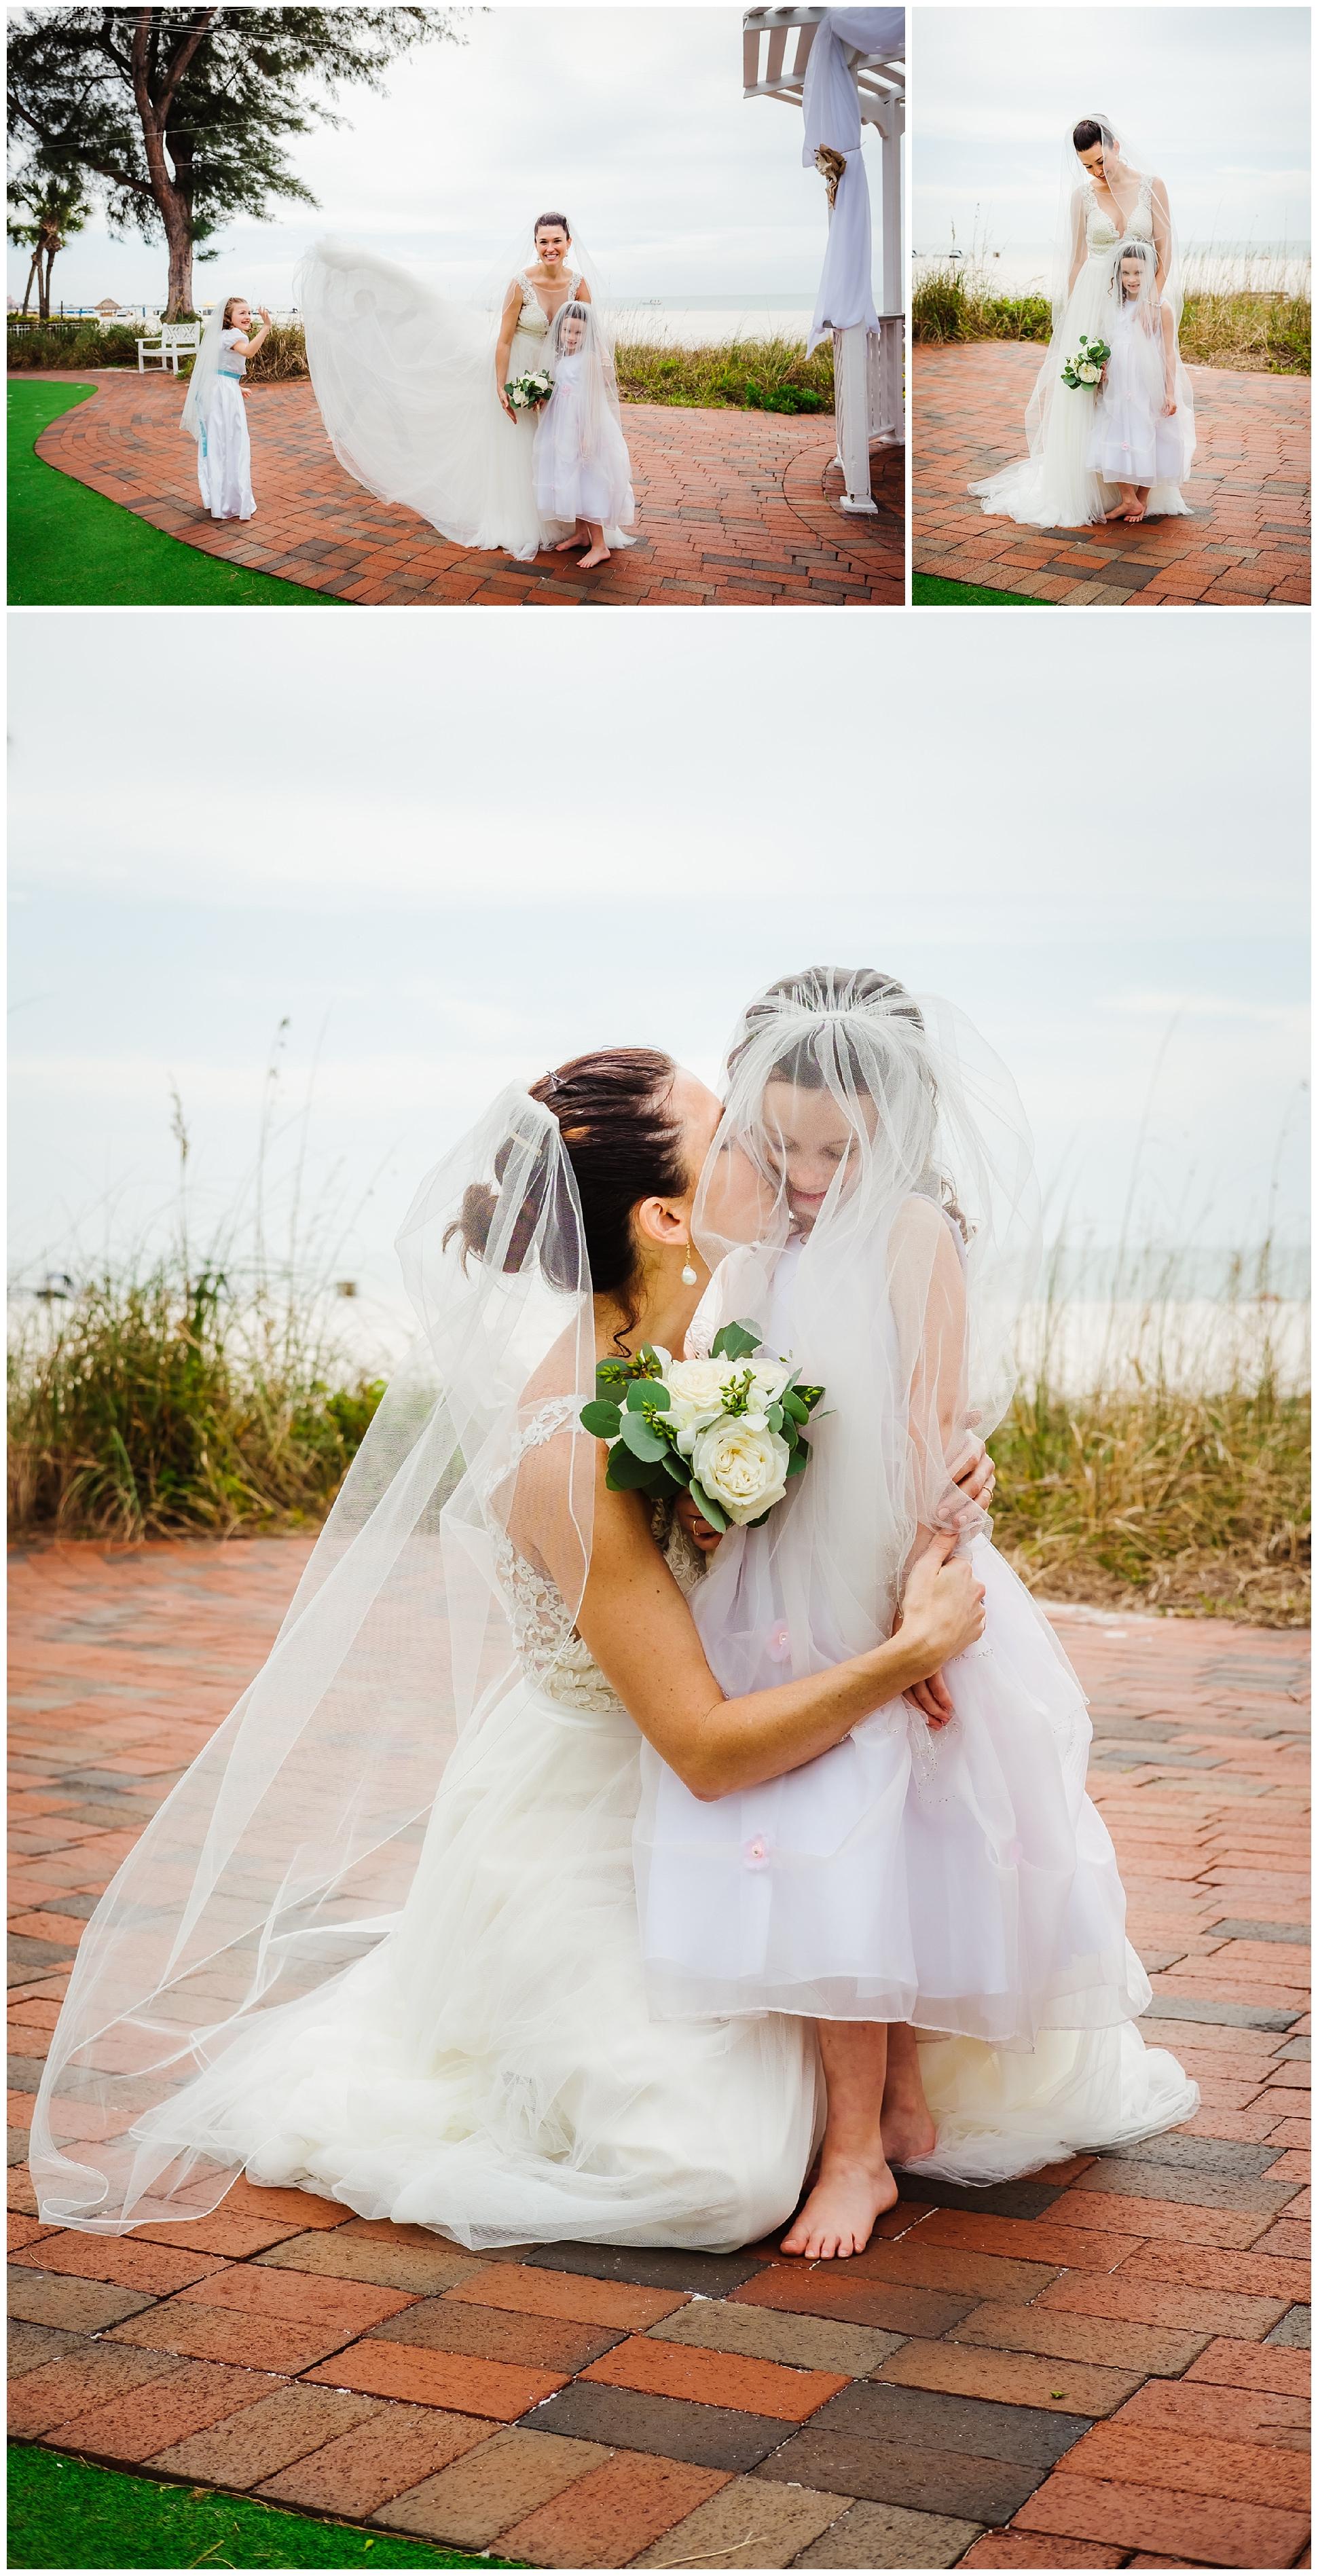 tampa-wedding-photographer-tradewinds-beach-family-elopement_0106.jpg